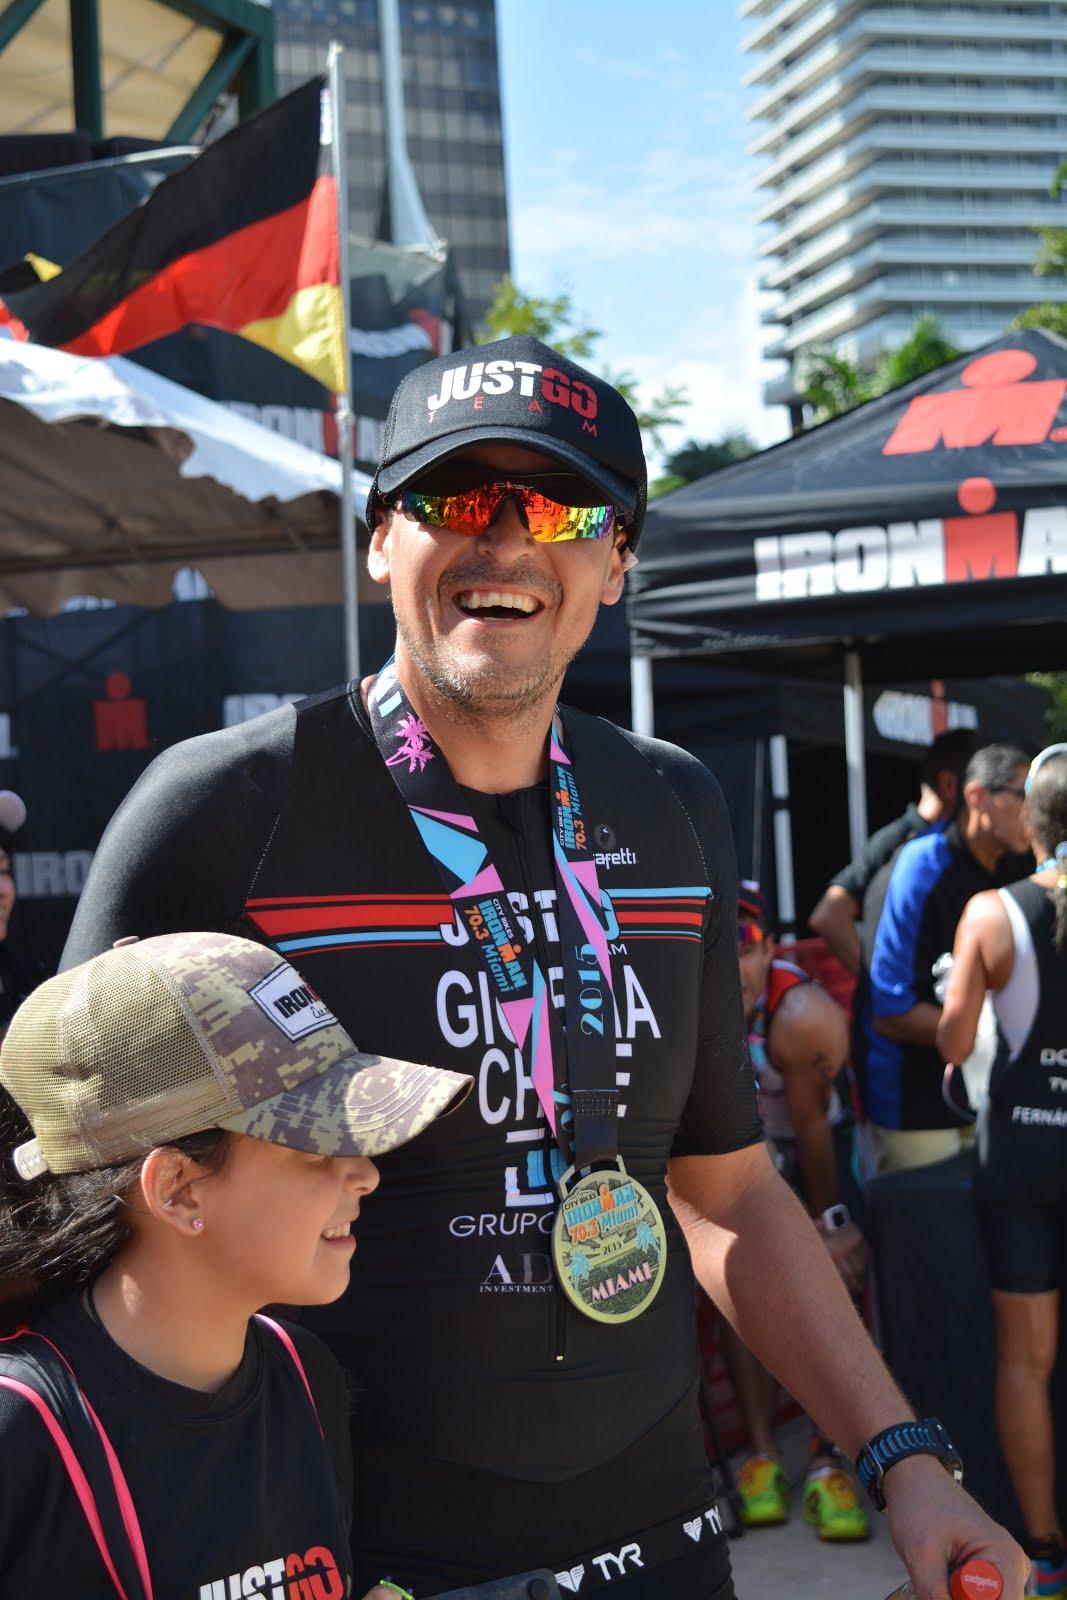 Jorge Gigena Coach